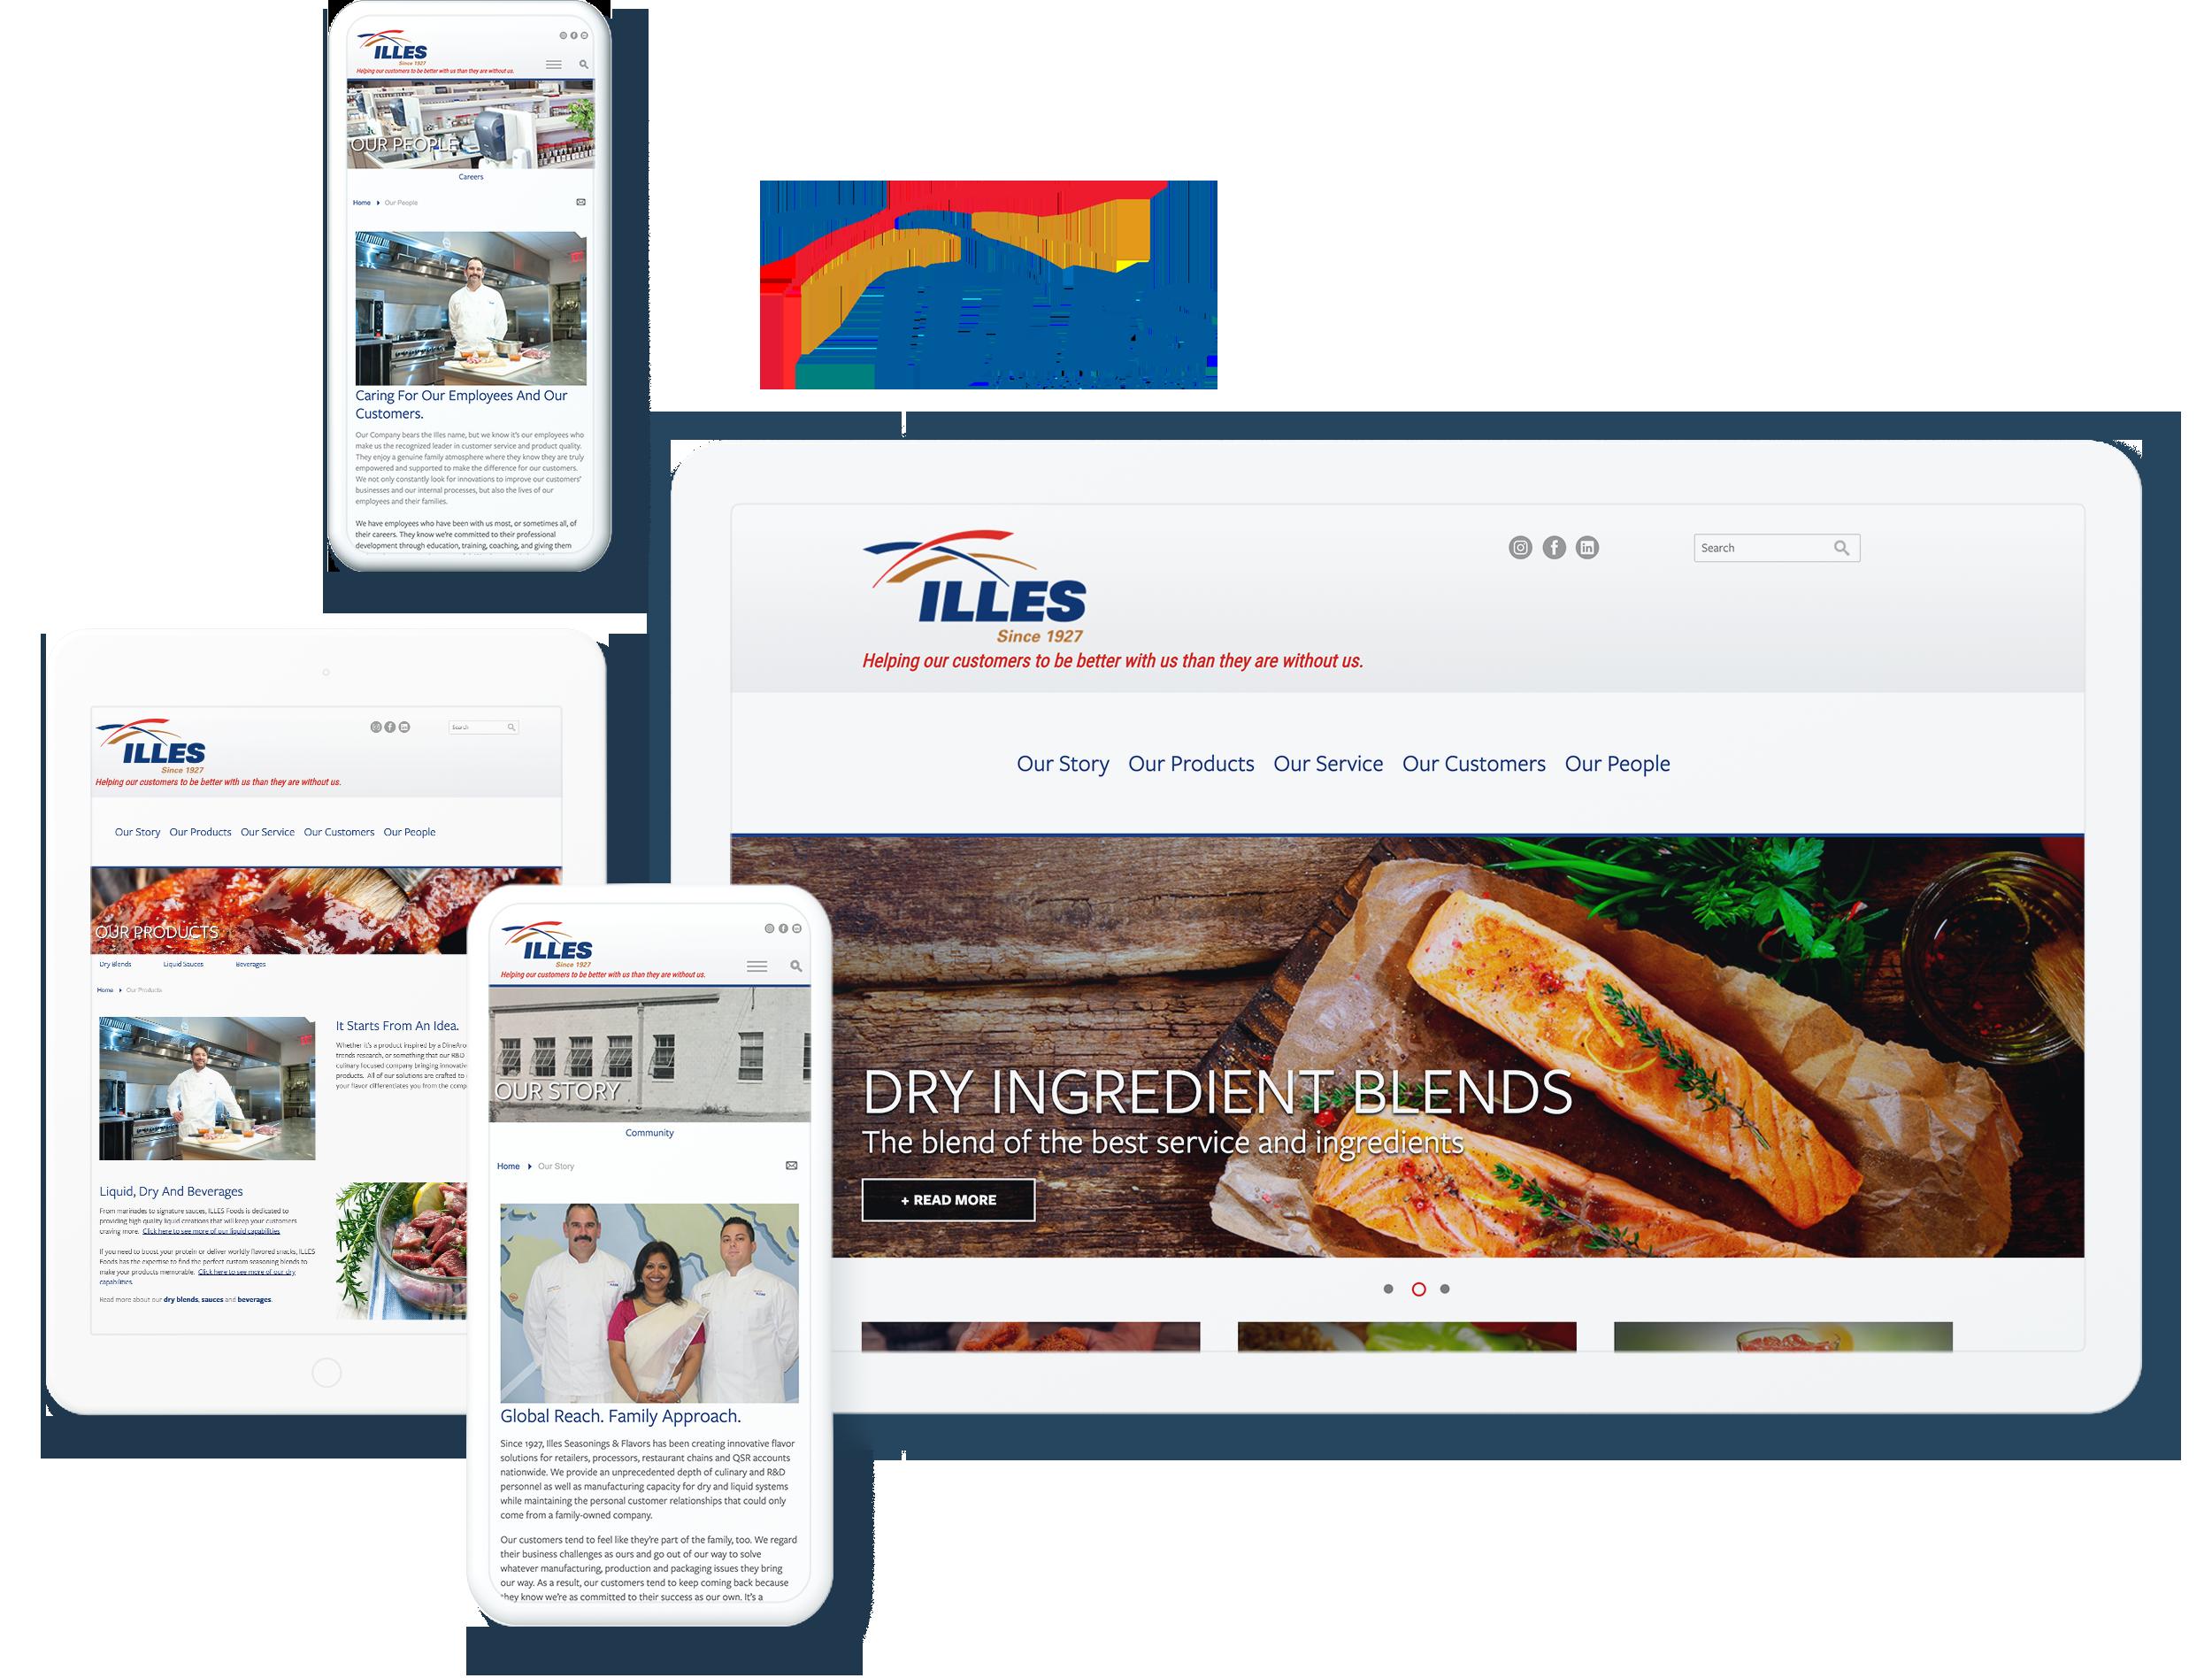 Illes_Foods_Spotlight